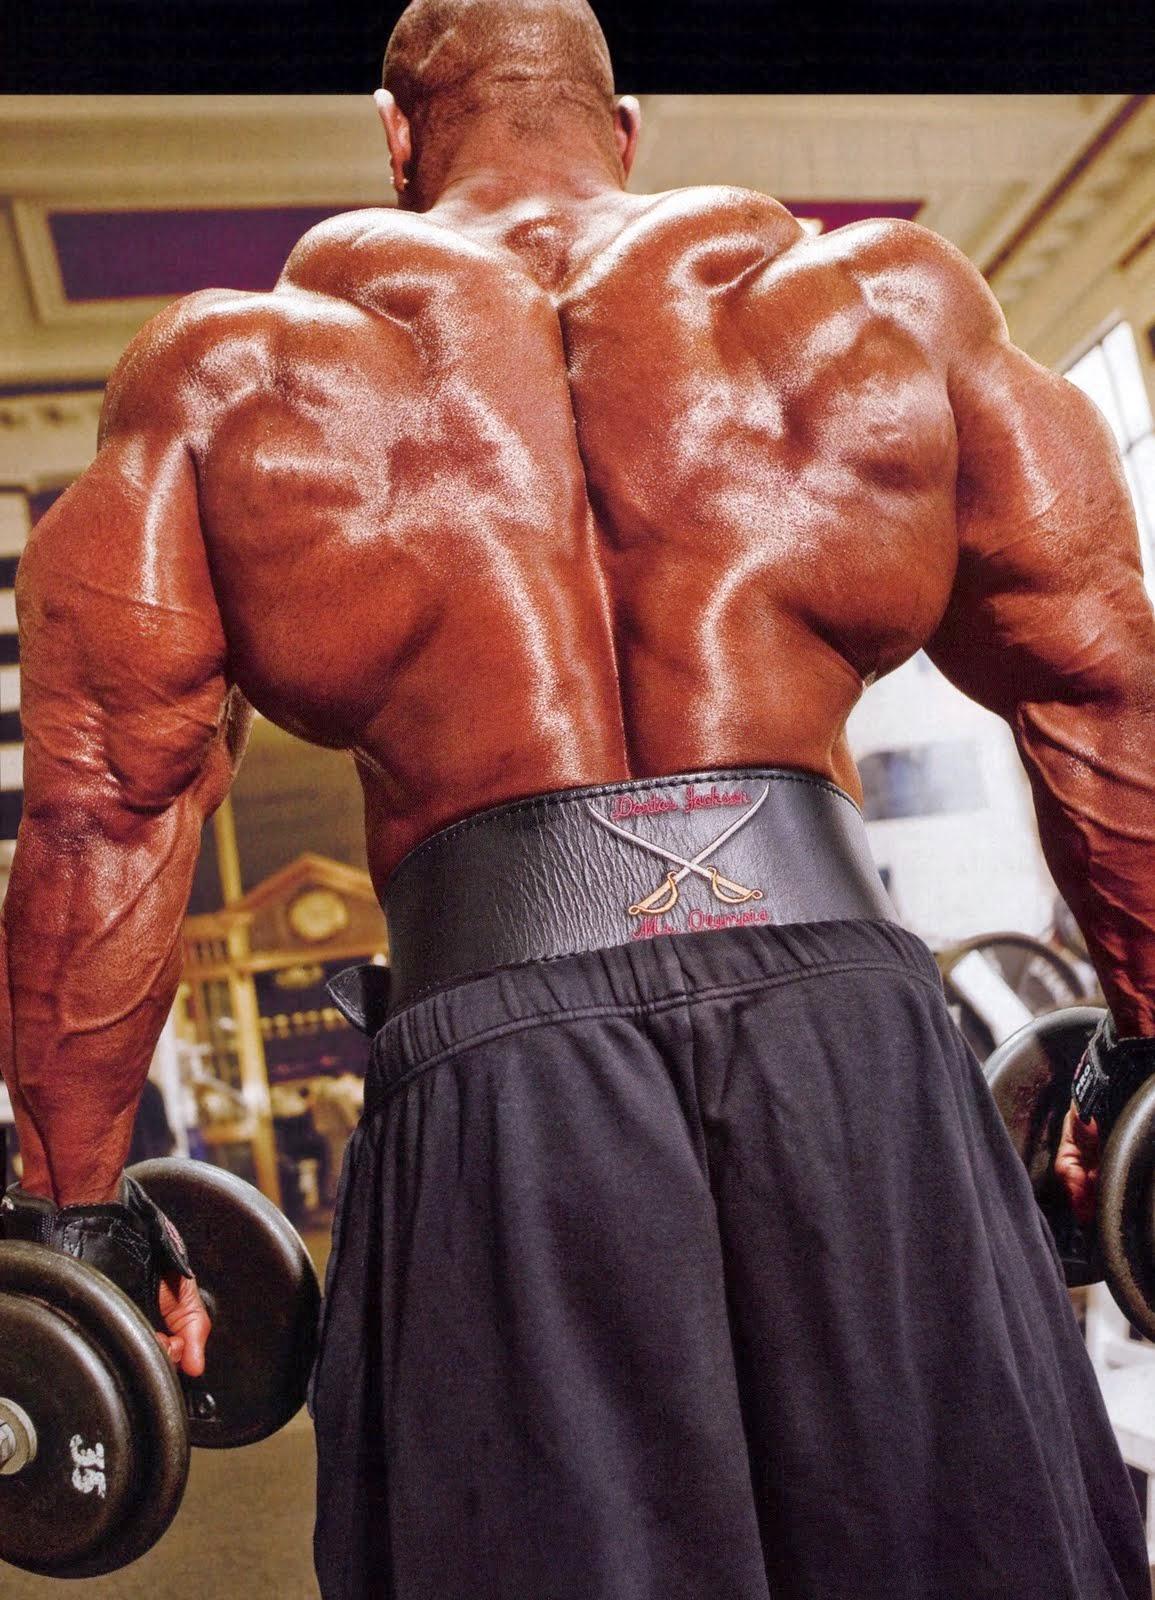 diatrofi bodybuilding ydatanthrakes